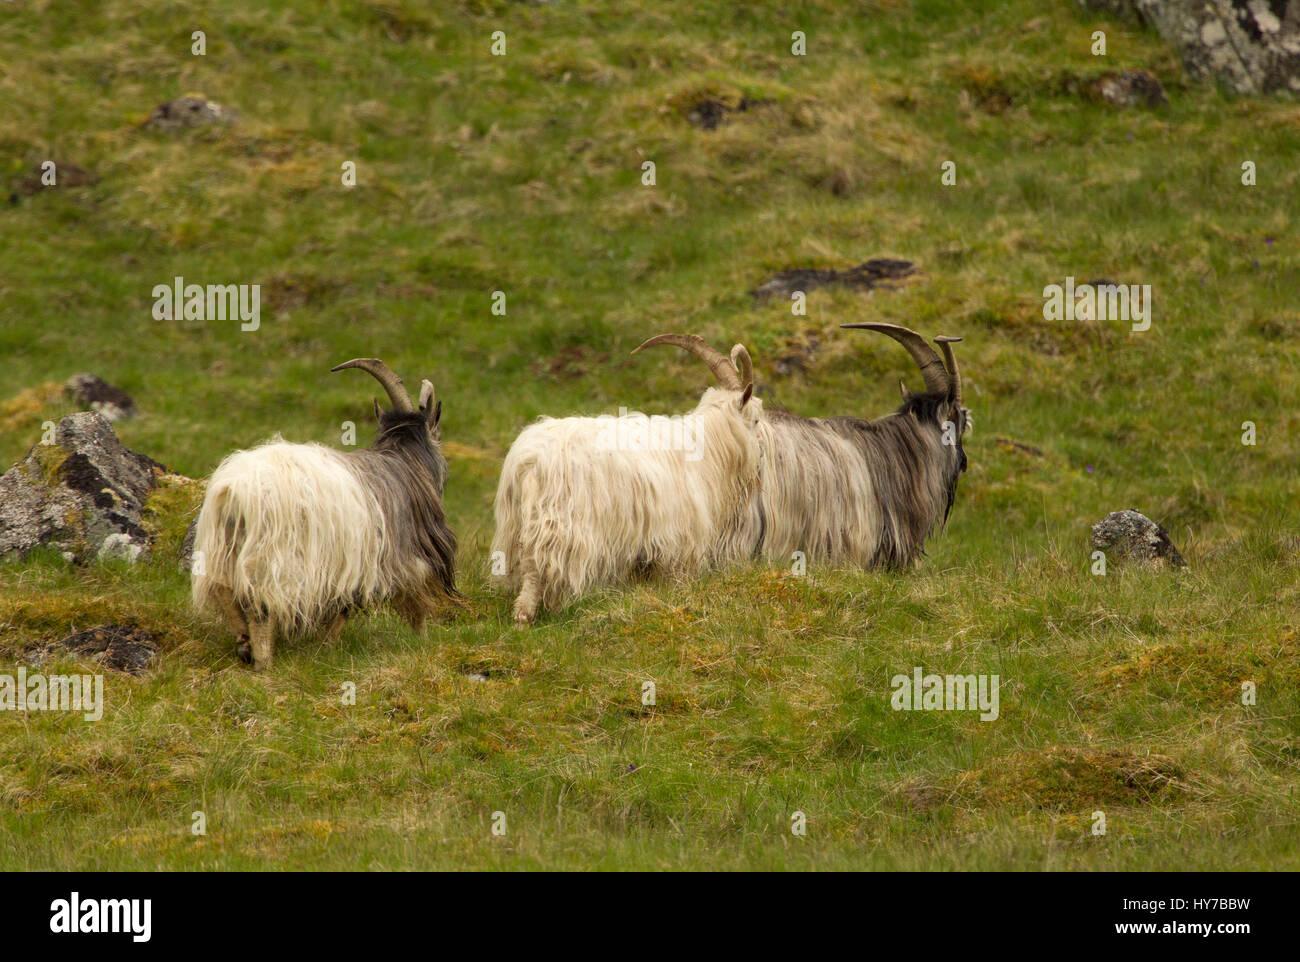 Feral Goats, back view of three adult walking on hillside. Taken June. Findhorn Valley, Nr Tomatin, Scotland, UK. - Stock Image